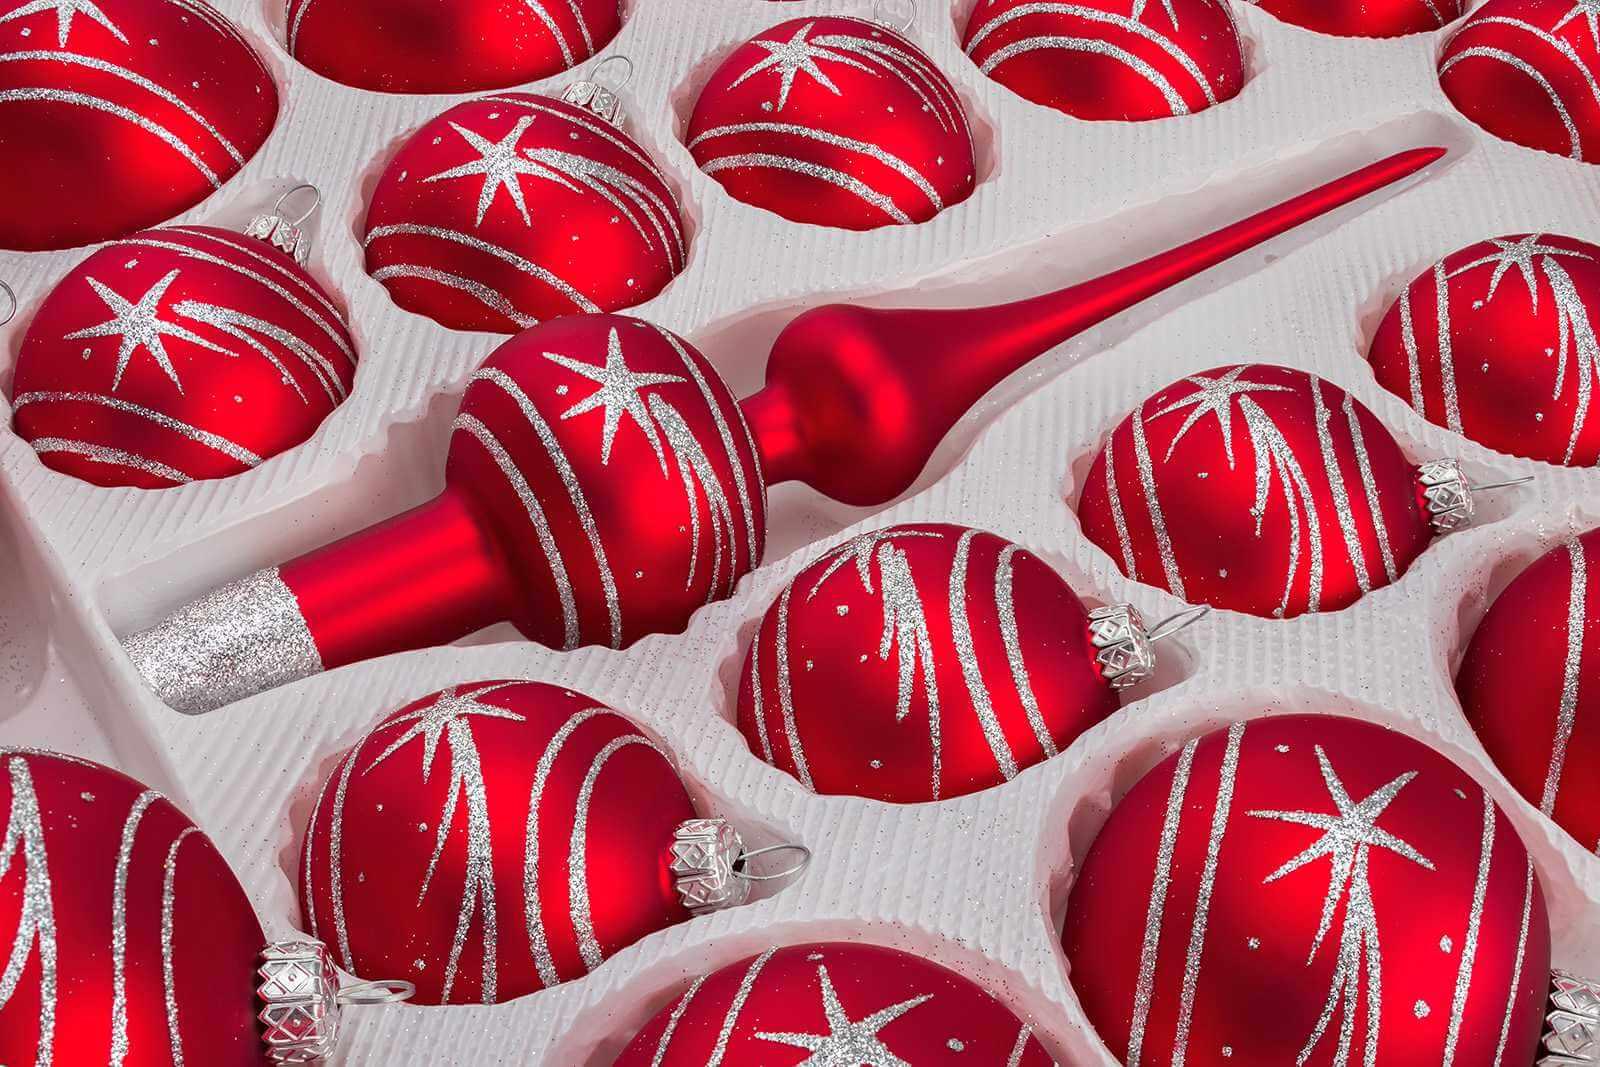 christbaumkugeln und mehr 39 tlg glas weihnachtskugeln set in classic rot silber komet. Black Bedroom Furniture Sets. Home Design Ideas